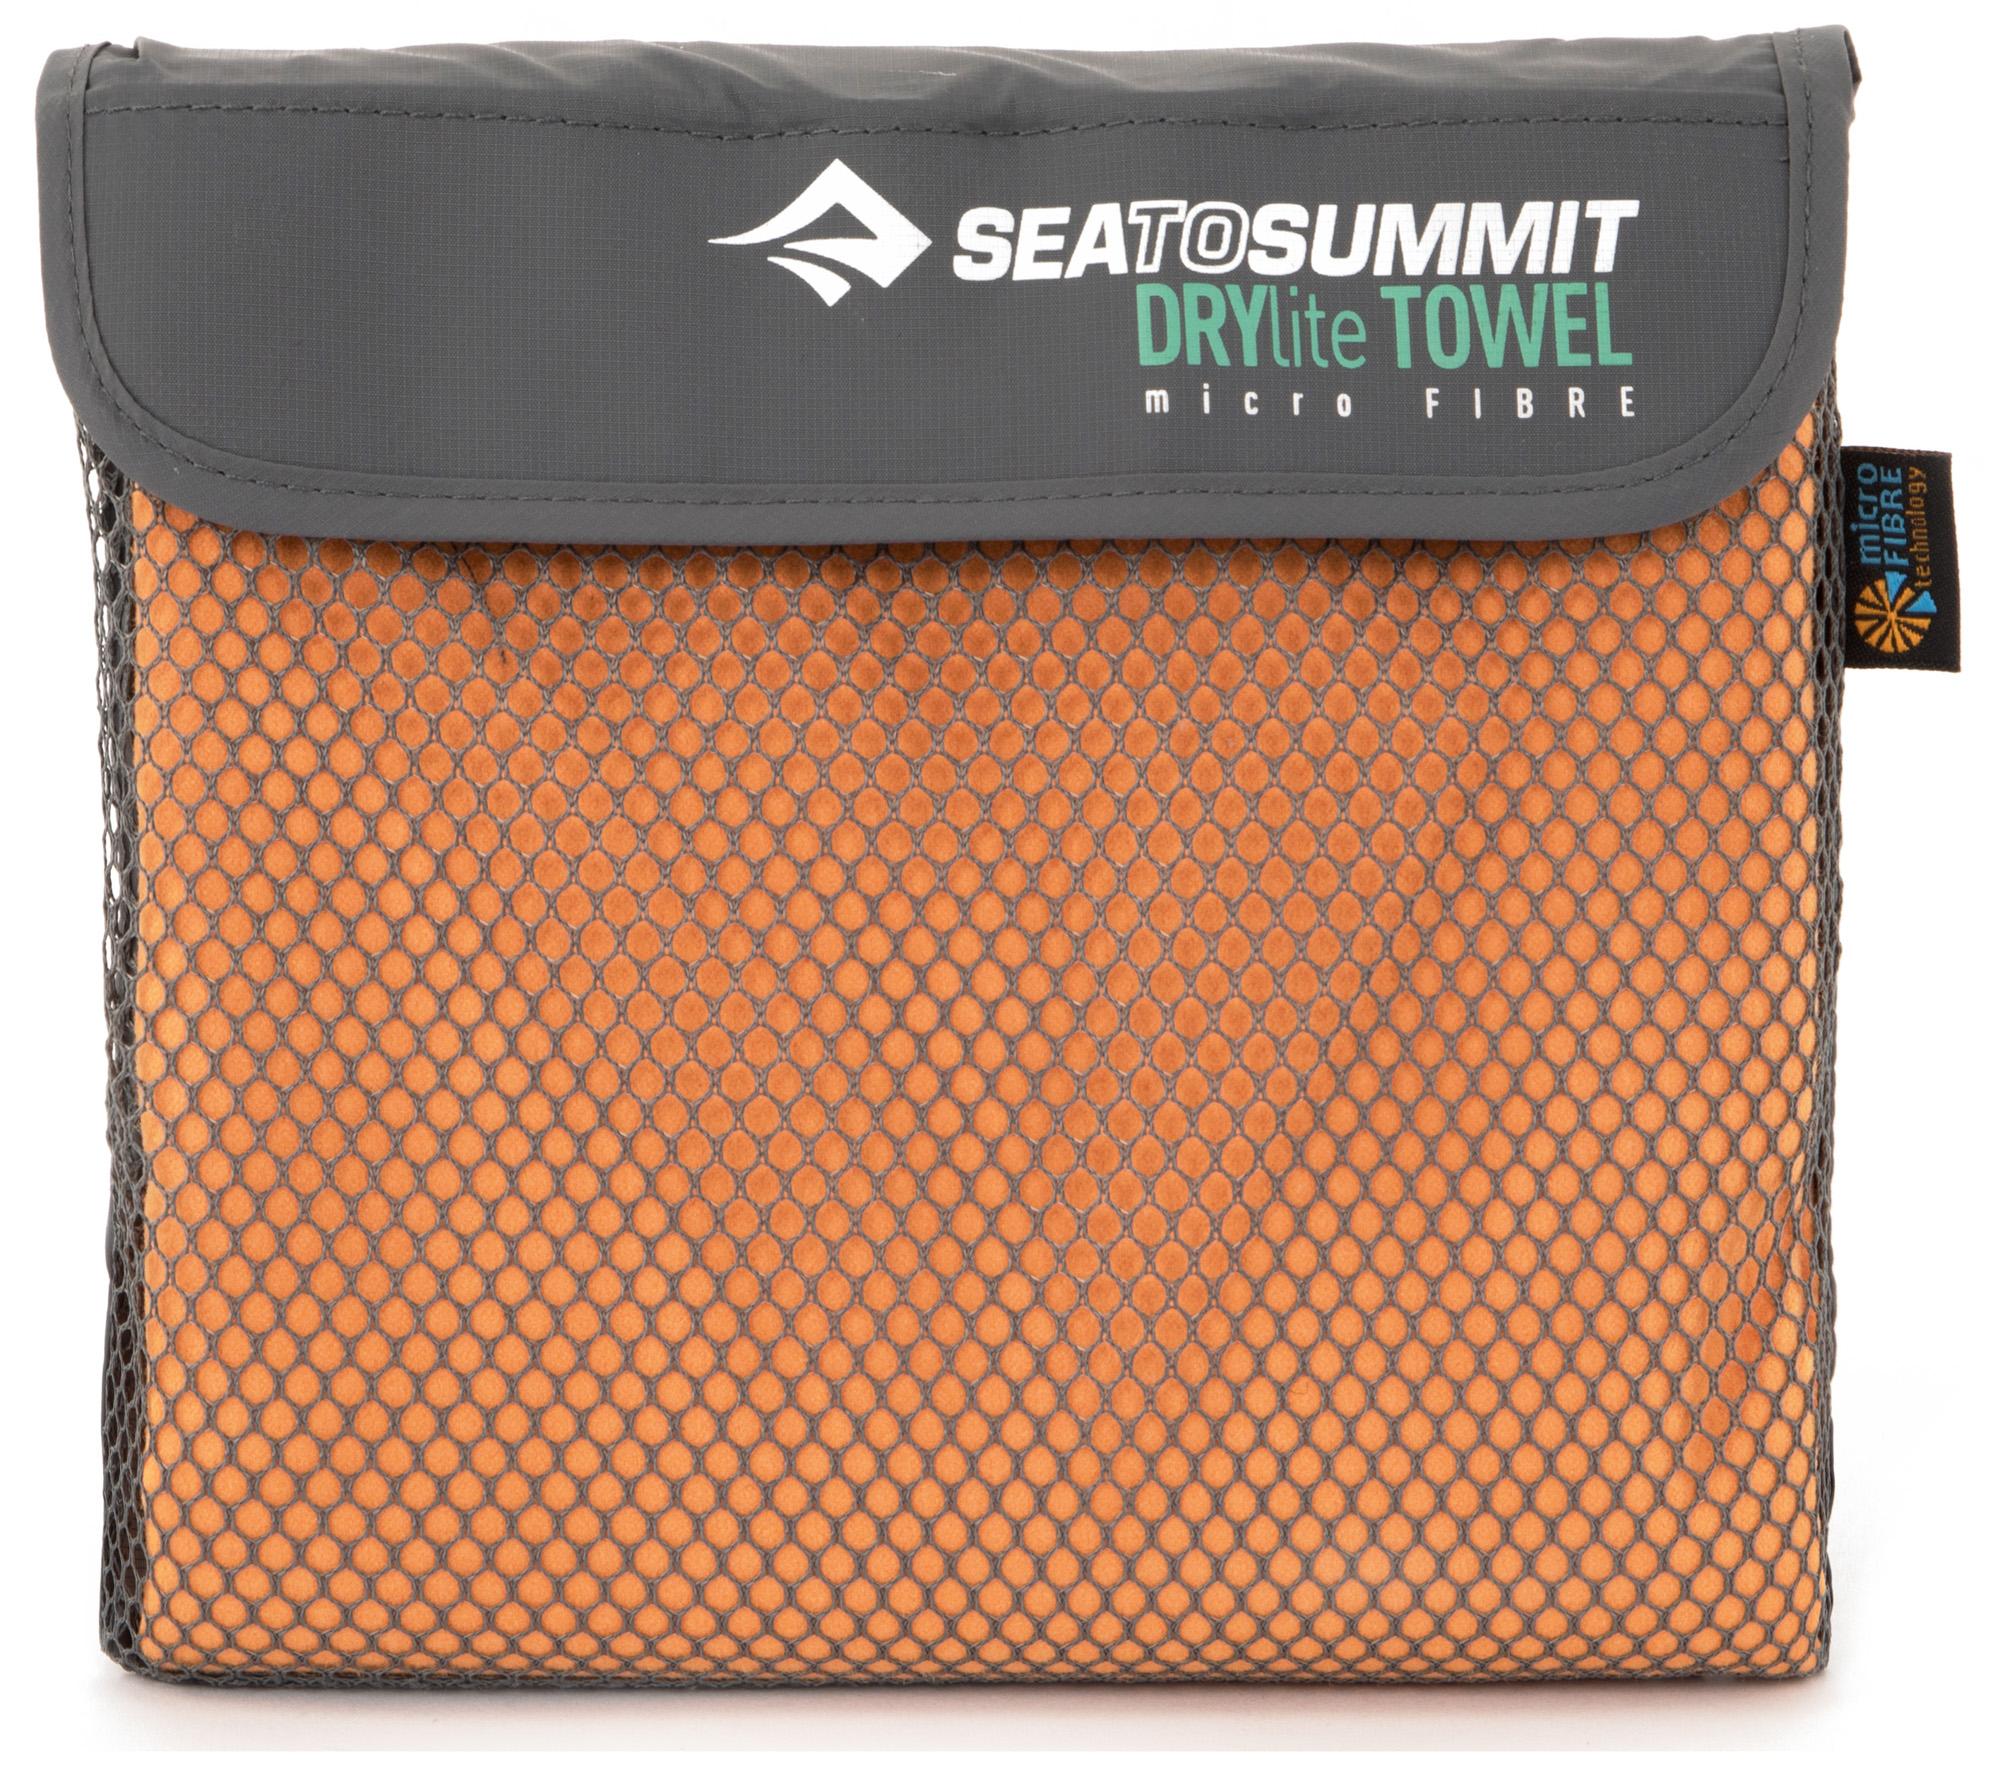 SEA TO SUMMIT Полотенце SEA TO SUMMIT DryLite 60 х 120 см комплектующие для спортивных сумок sea to summit 56928afrb25spp 2015 afrb25srpp